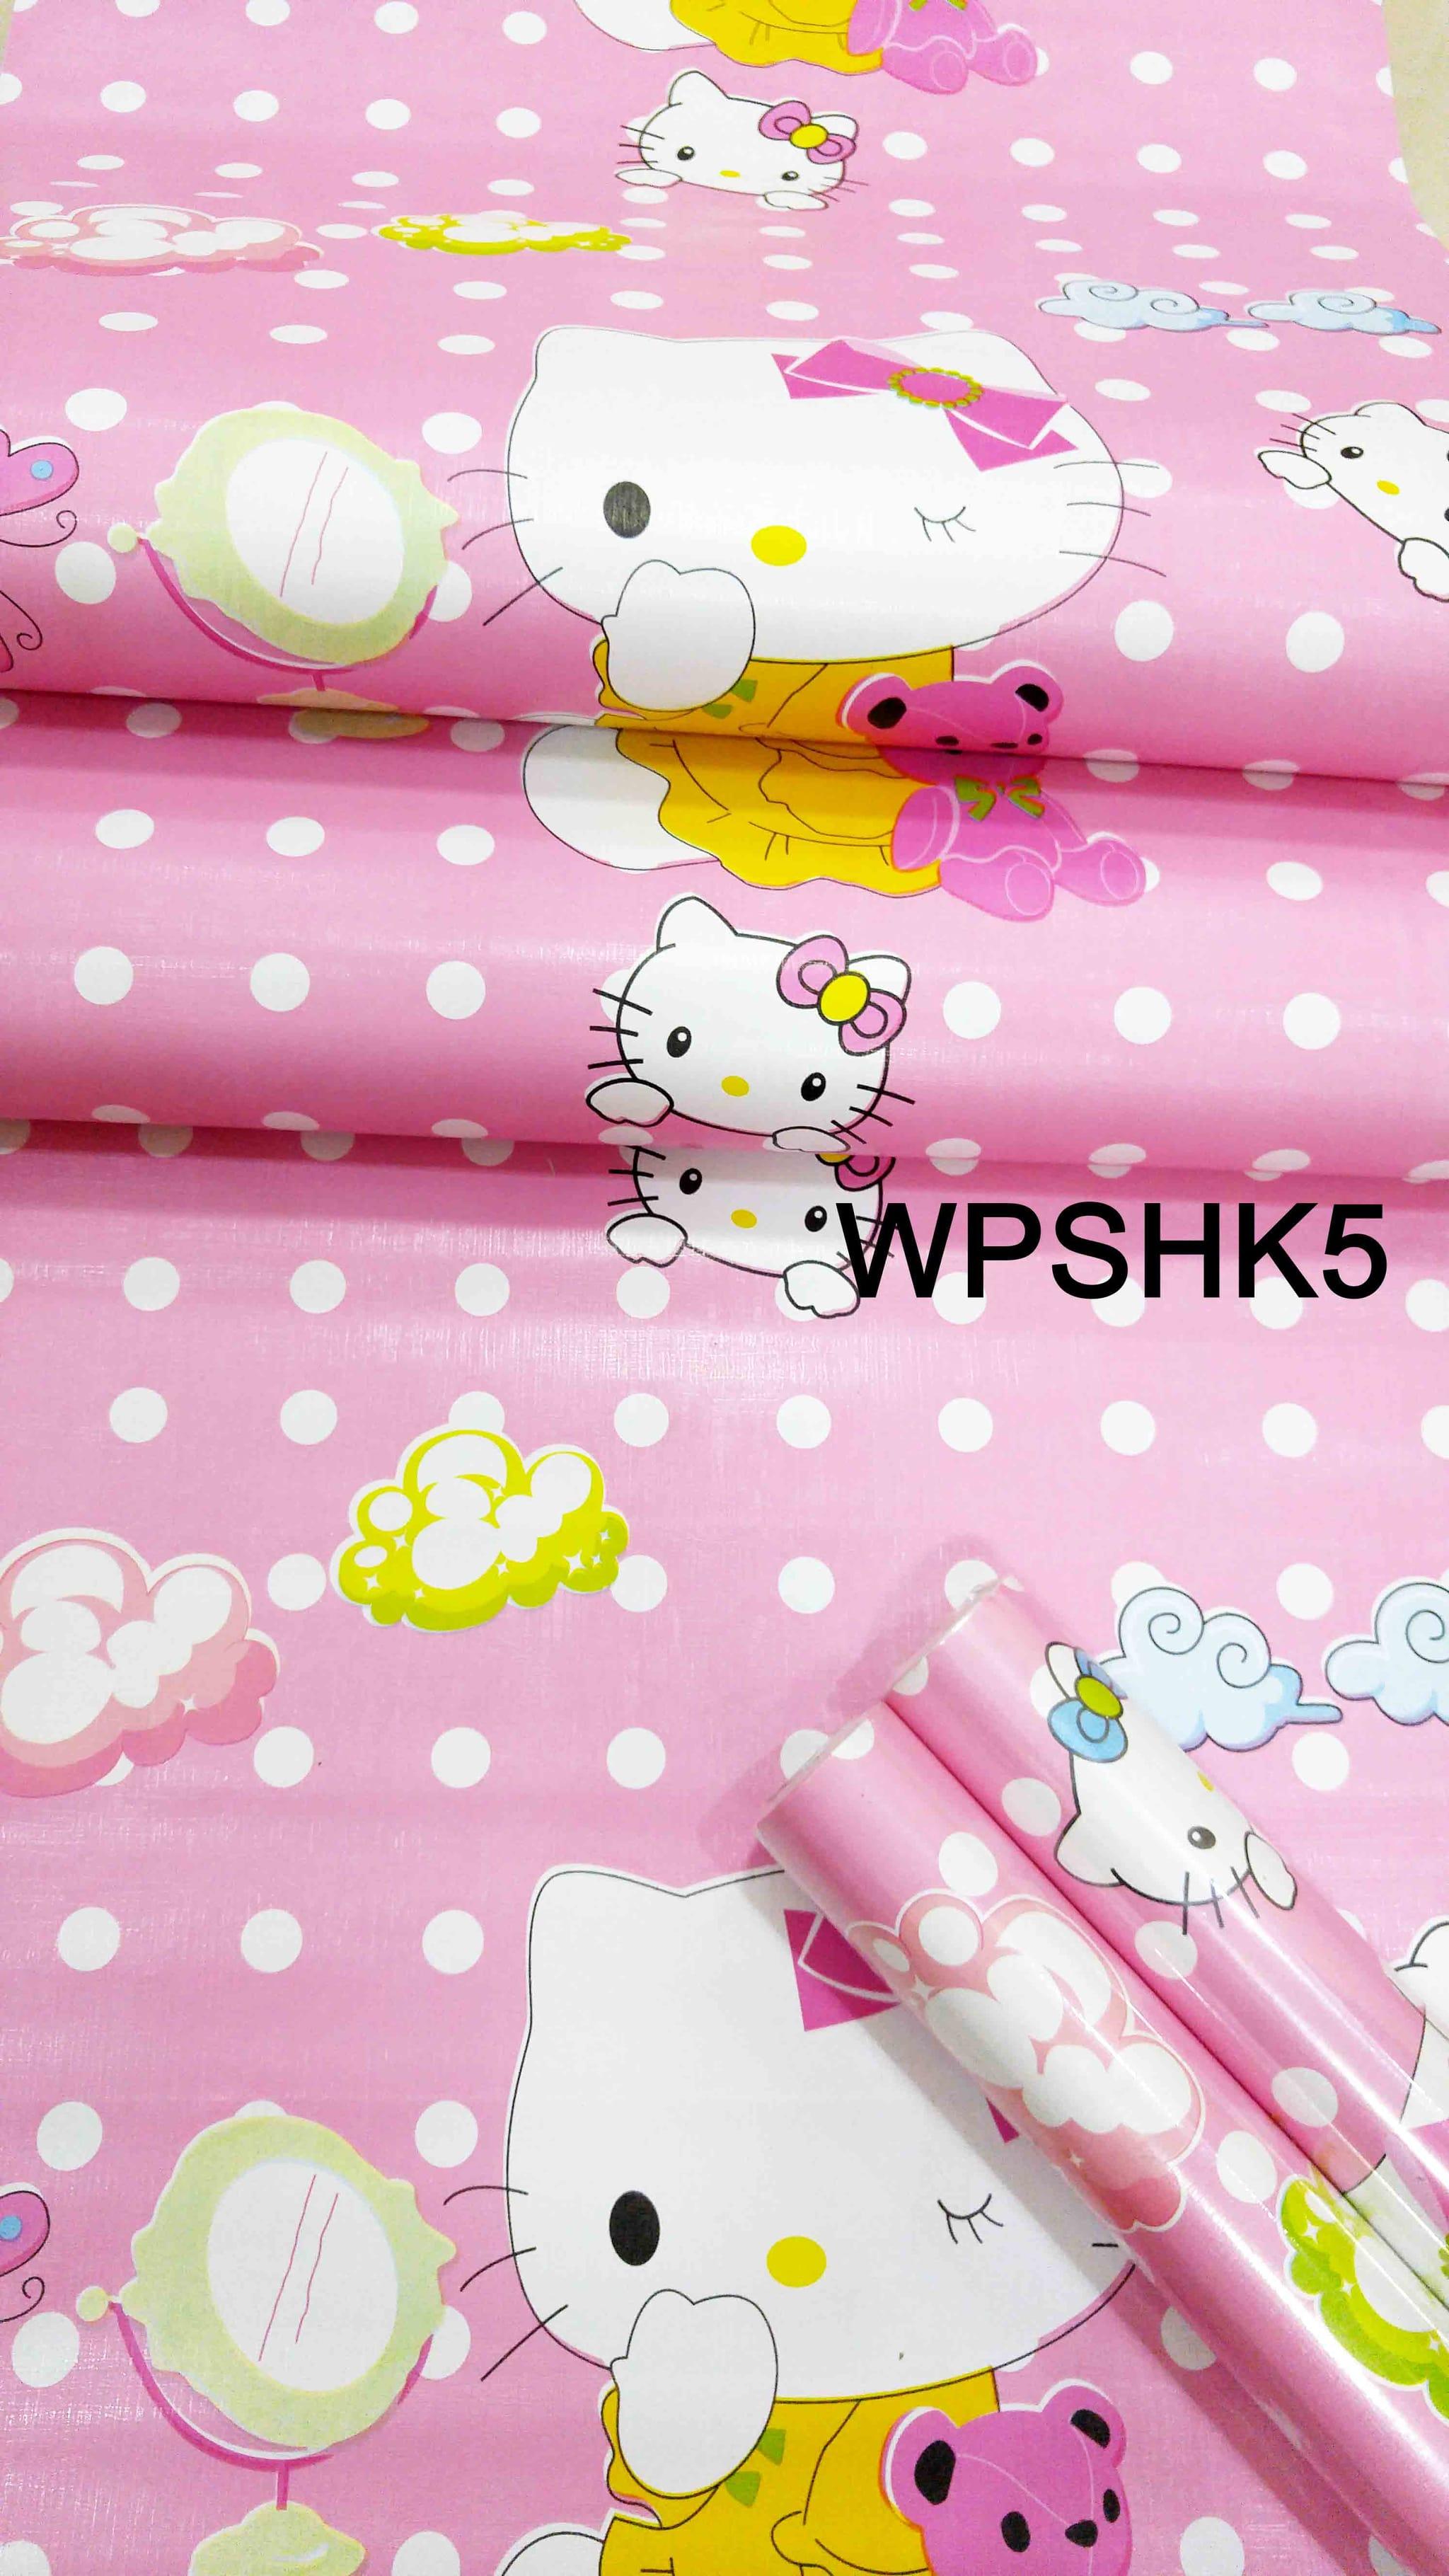 Jual Wallpaper Sticker Terbaru 45cmx5m Wpshk5 Hello Kitty